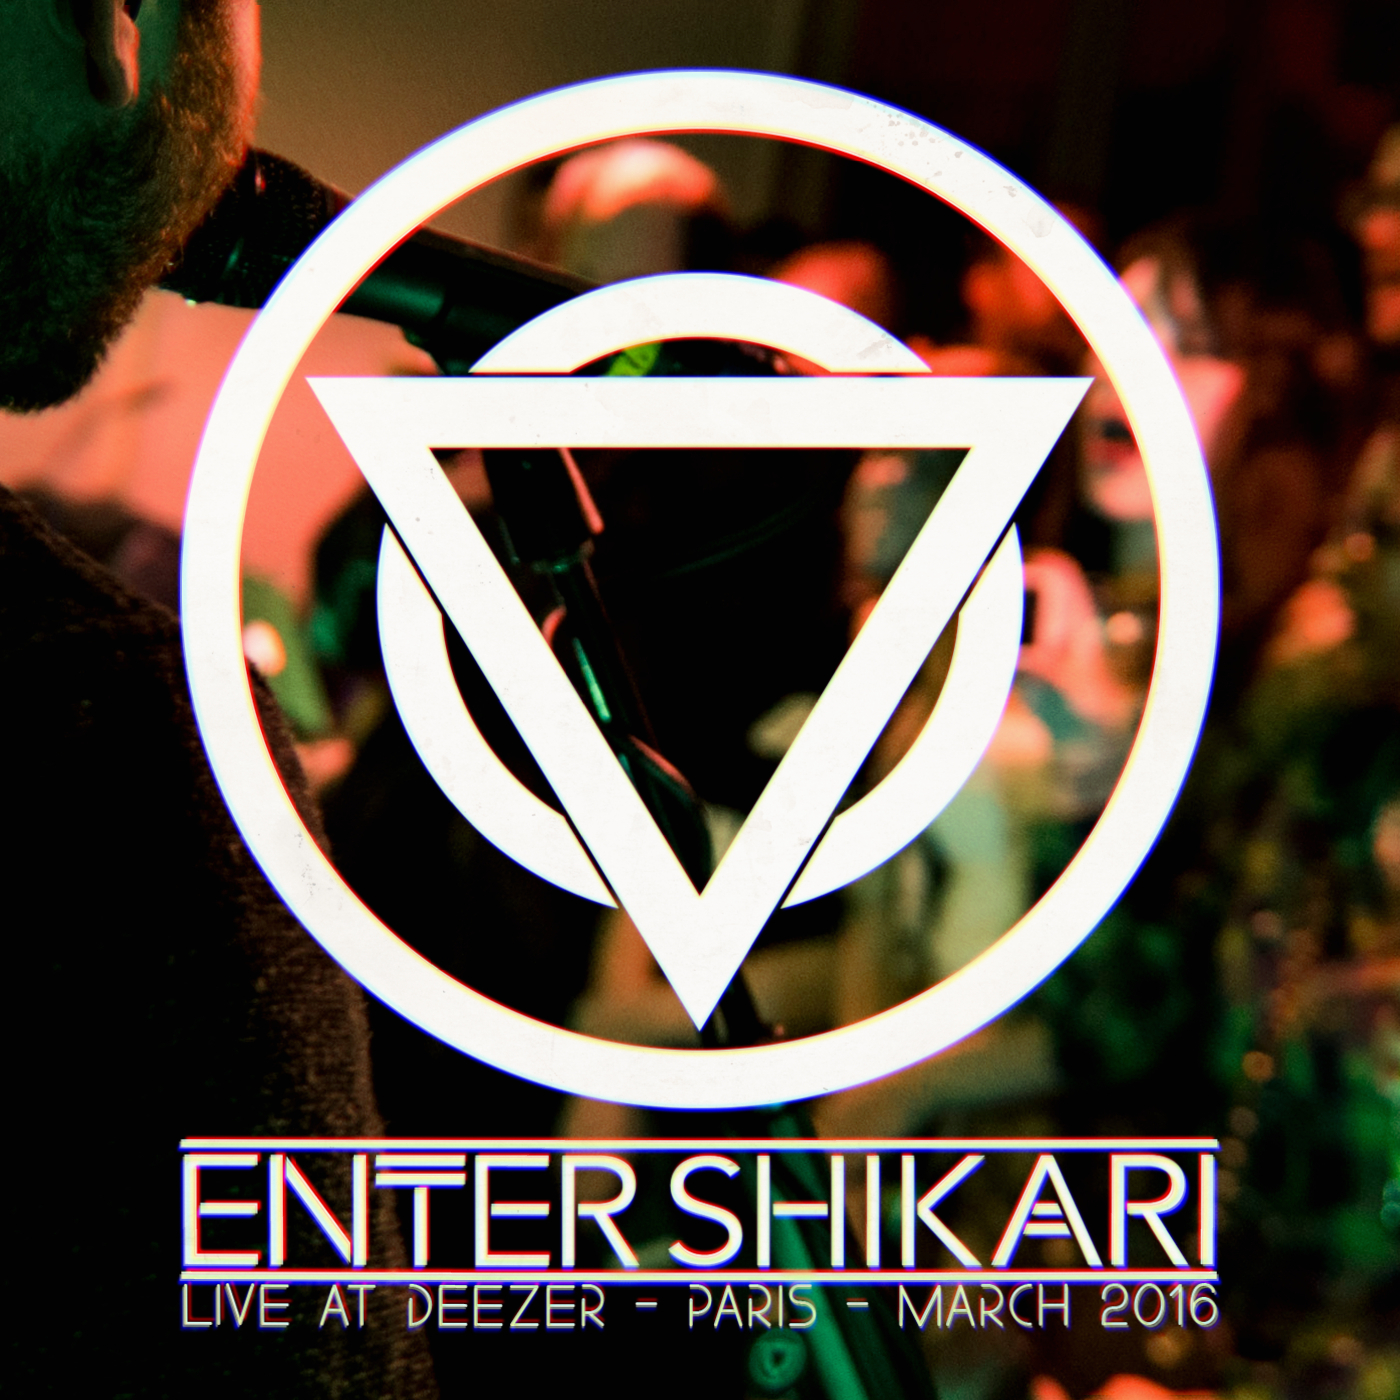 Enter Shikari - Enter Shikari live at Deezer (2016)